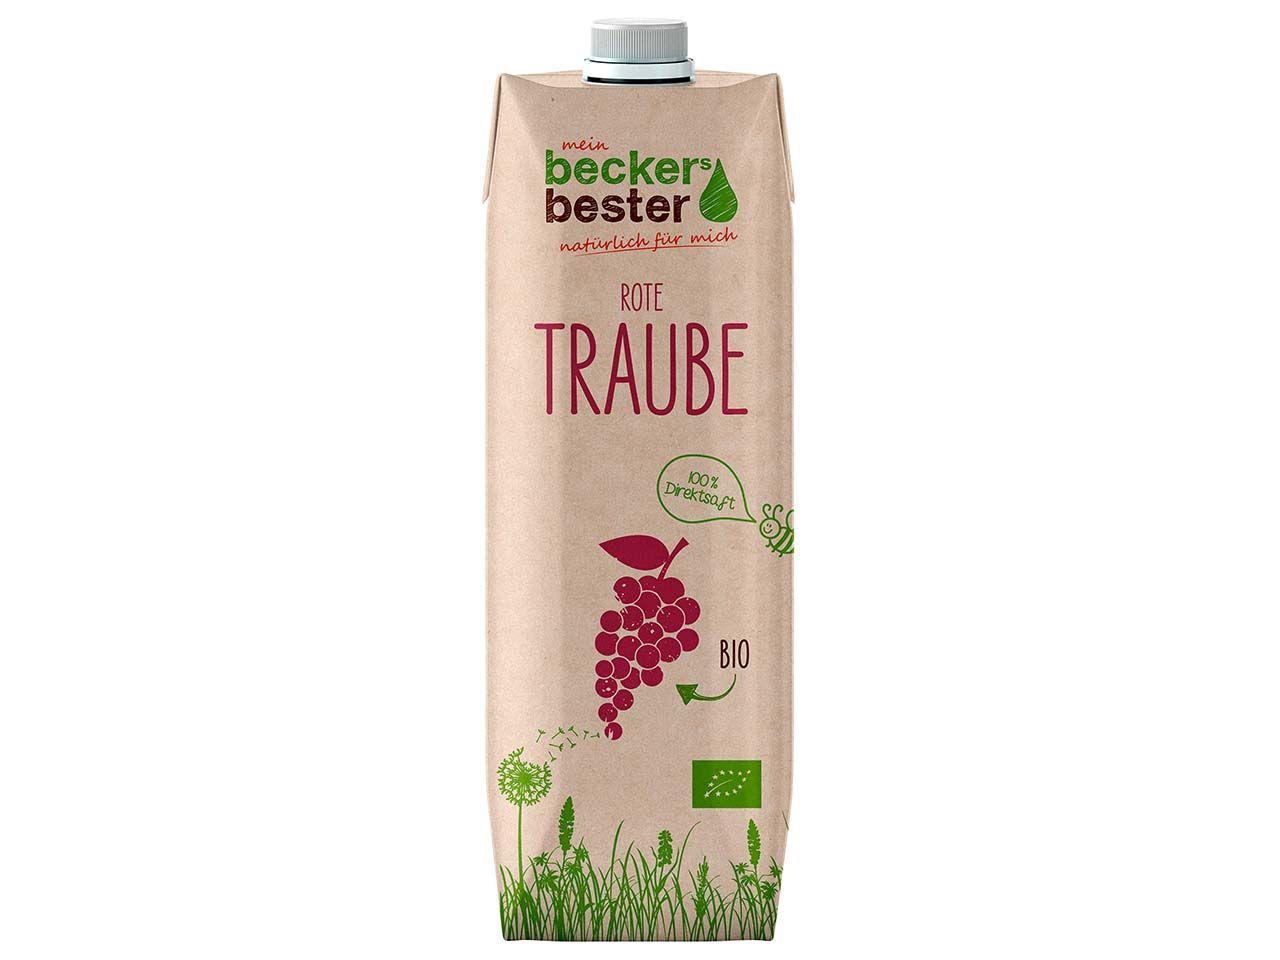 beckers bester Bio-Traubendirektsaft 1 l 76181